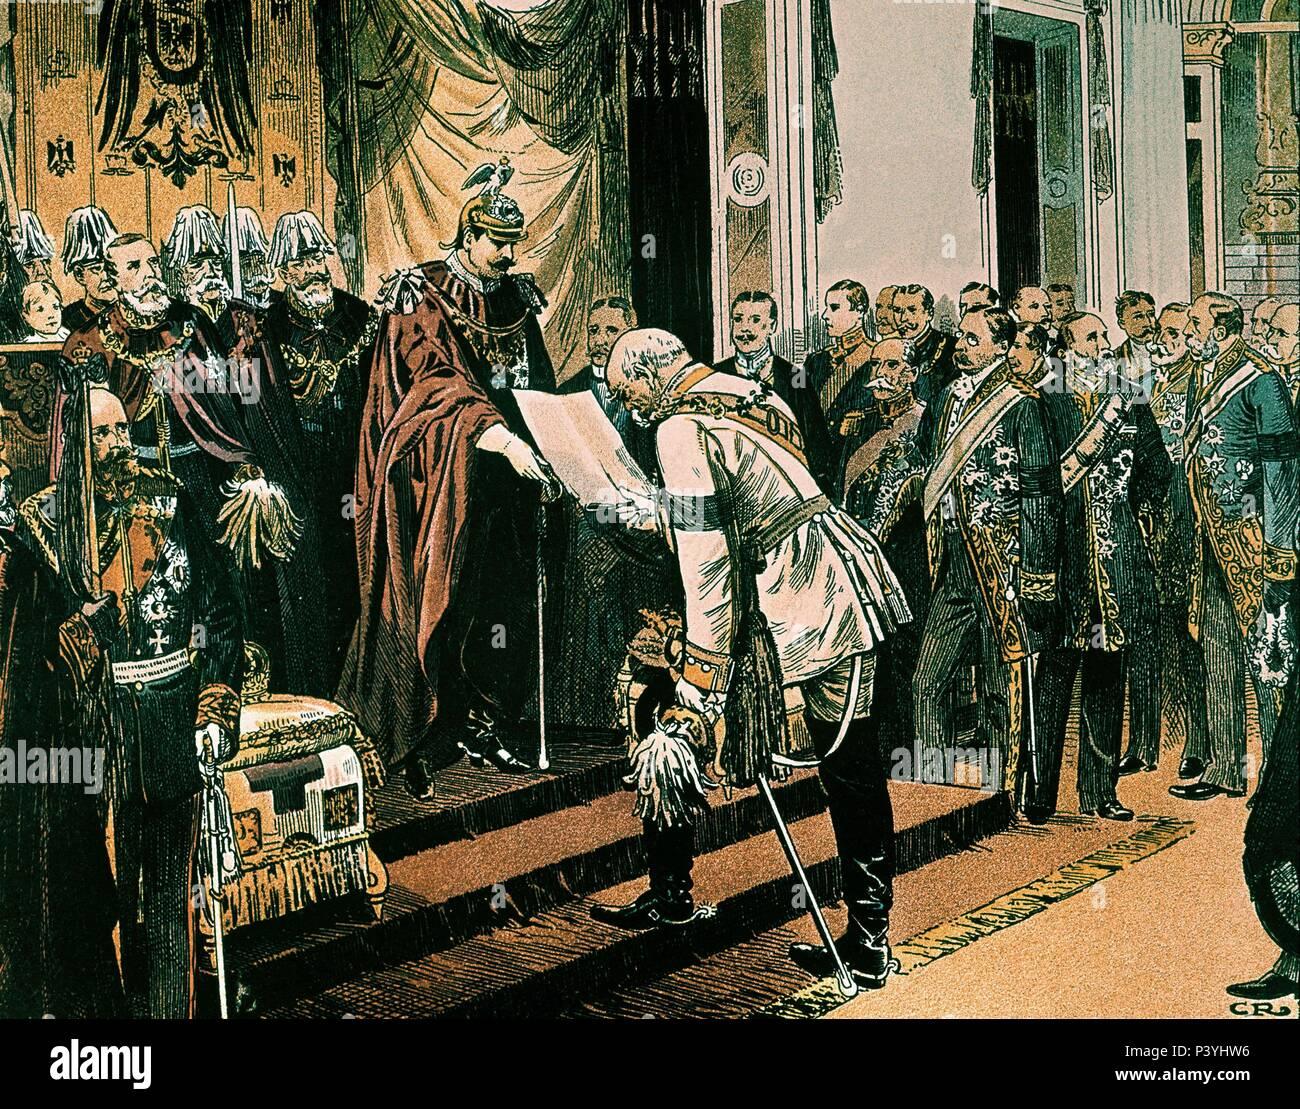 *GUILLERMO II DE PRUSIA Y BISMARCK. - Stock Image